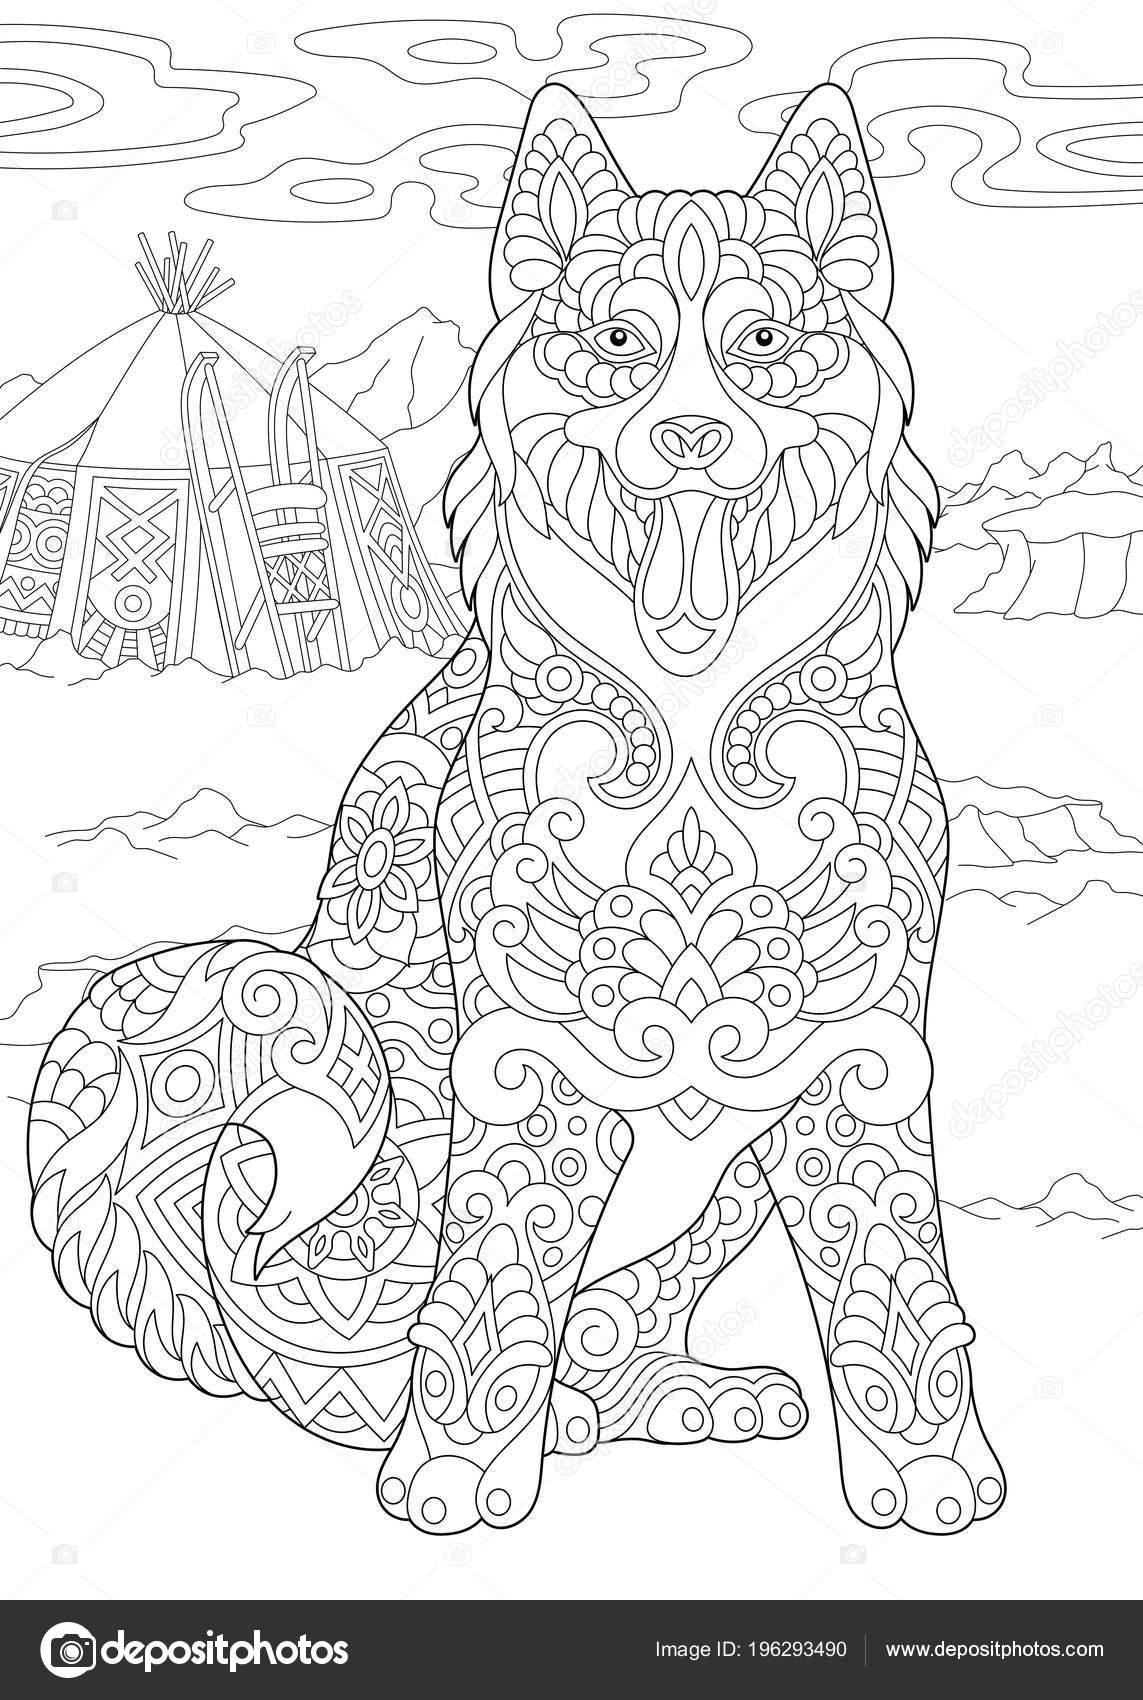 Malamute Alaska Siberian Husky Chien Esquimau Coloriage Idée